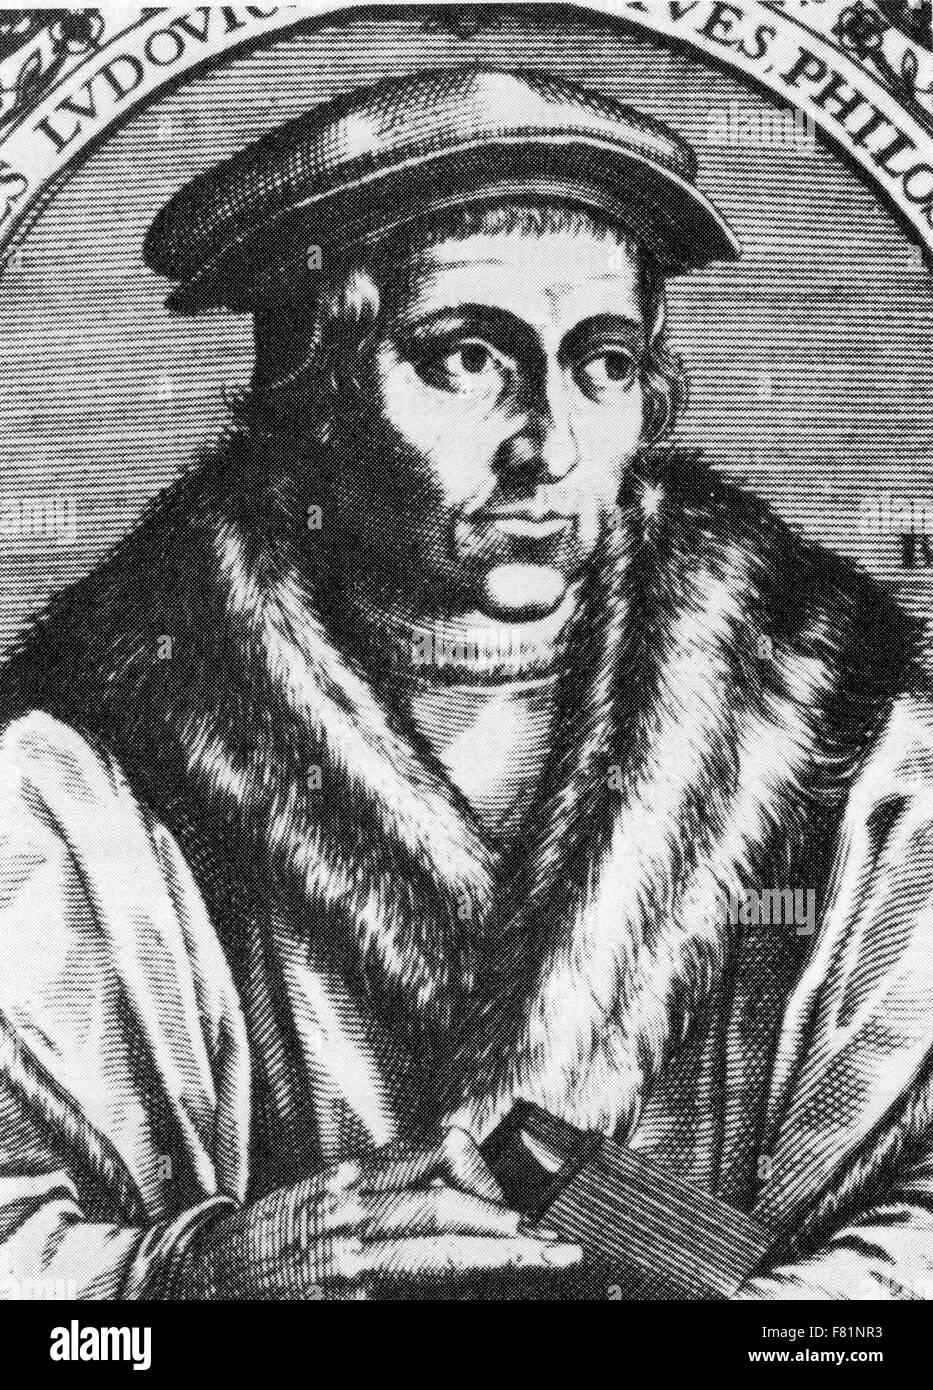 Juan luis vives 1493 1540 spanish born philosopher and humanist